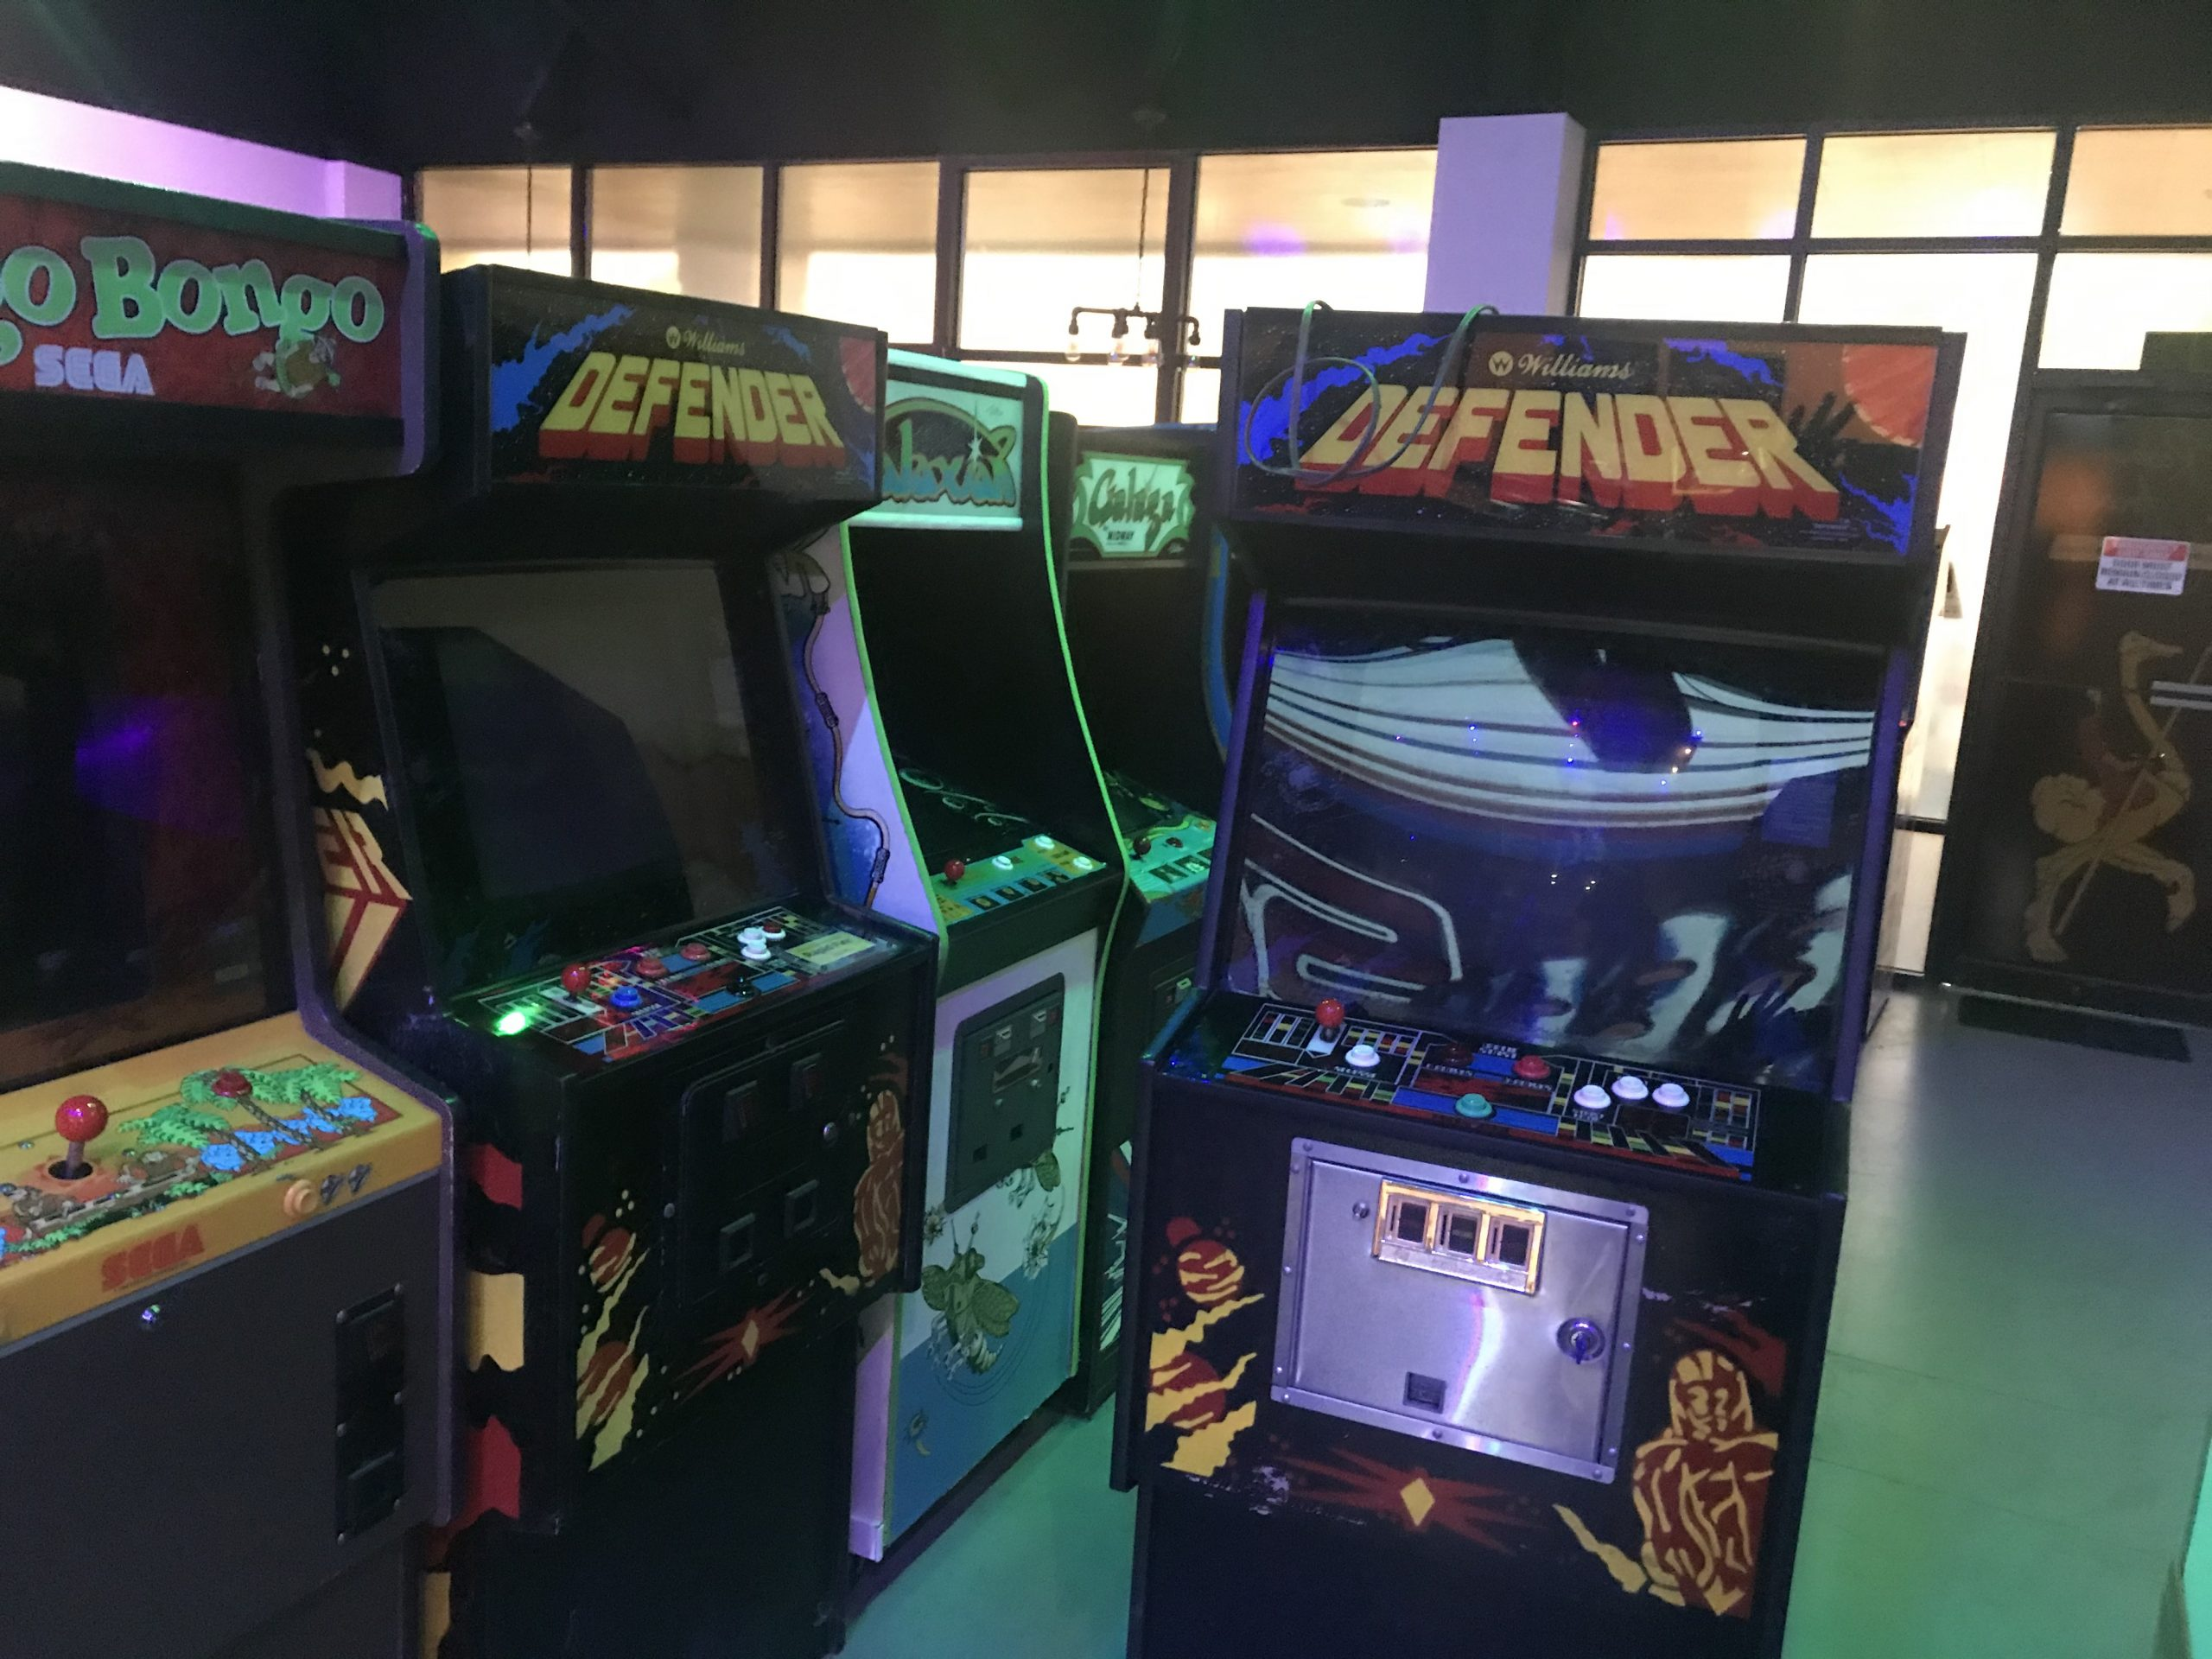 Image of Defender video game